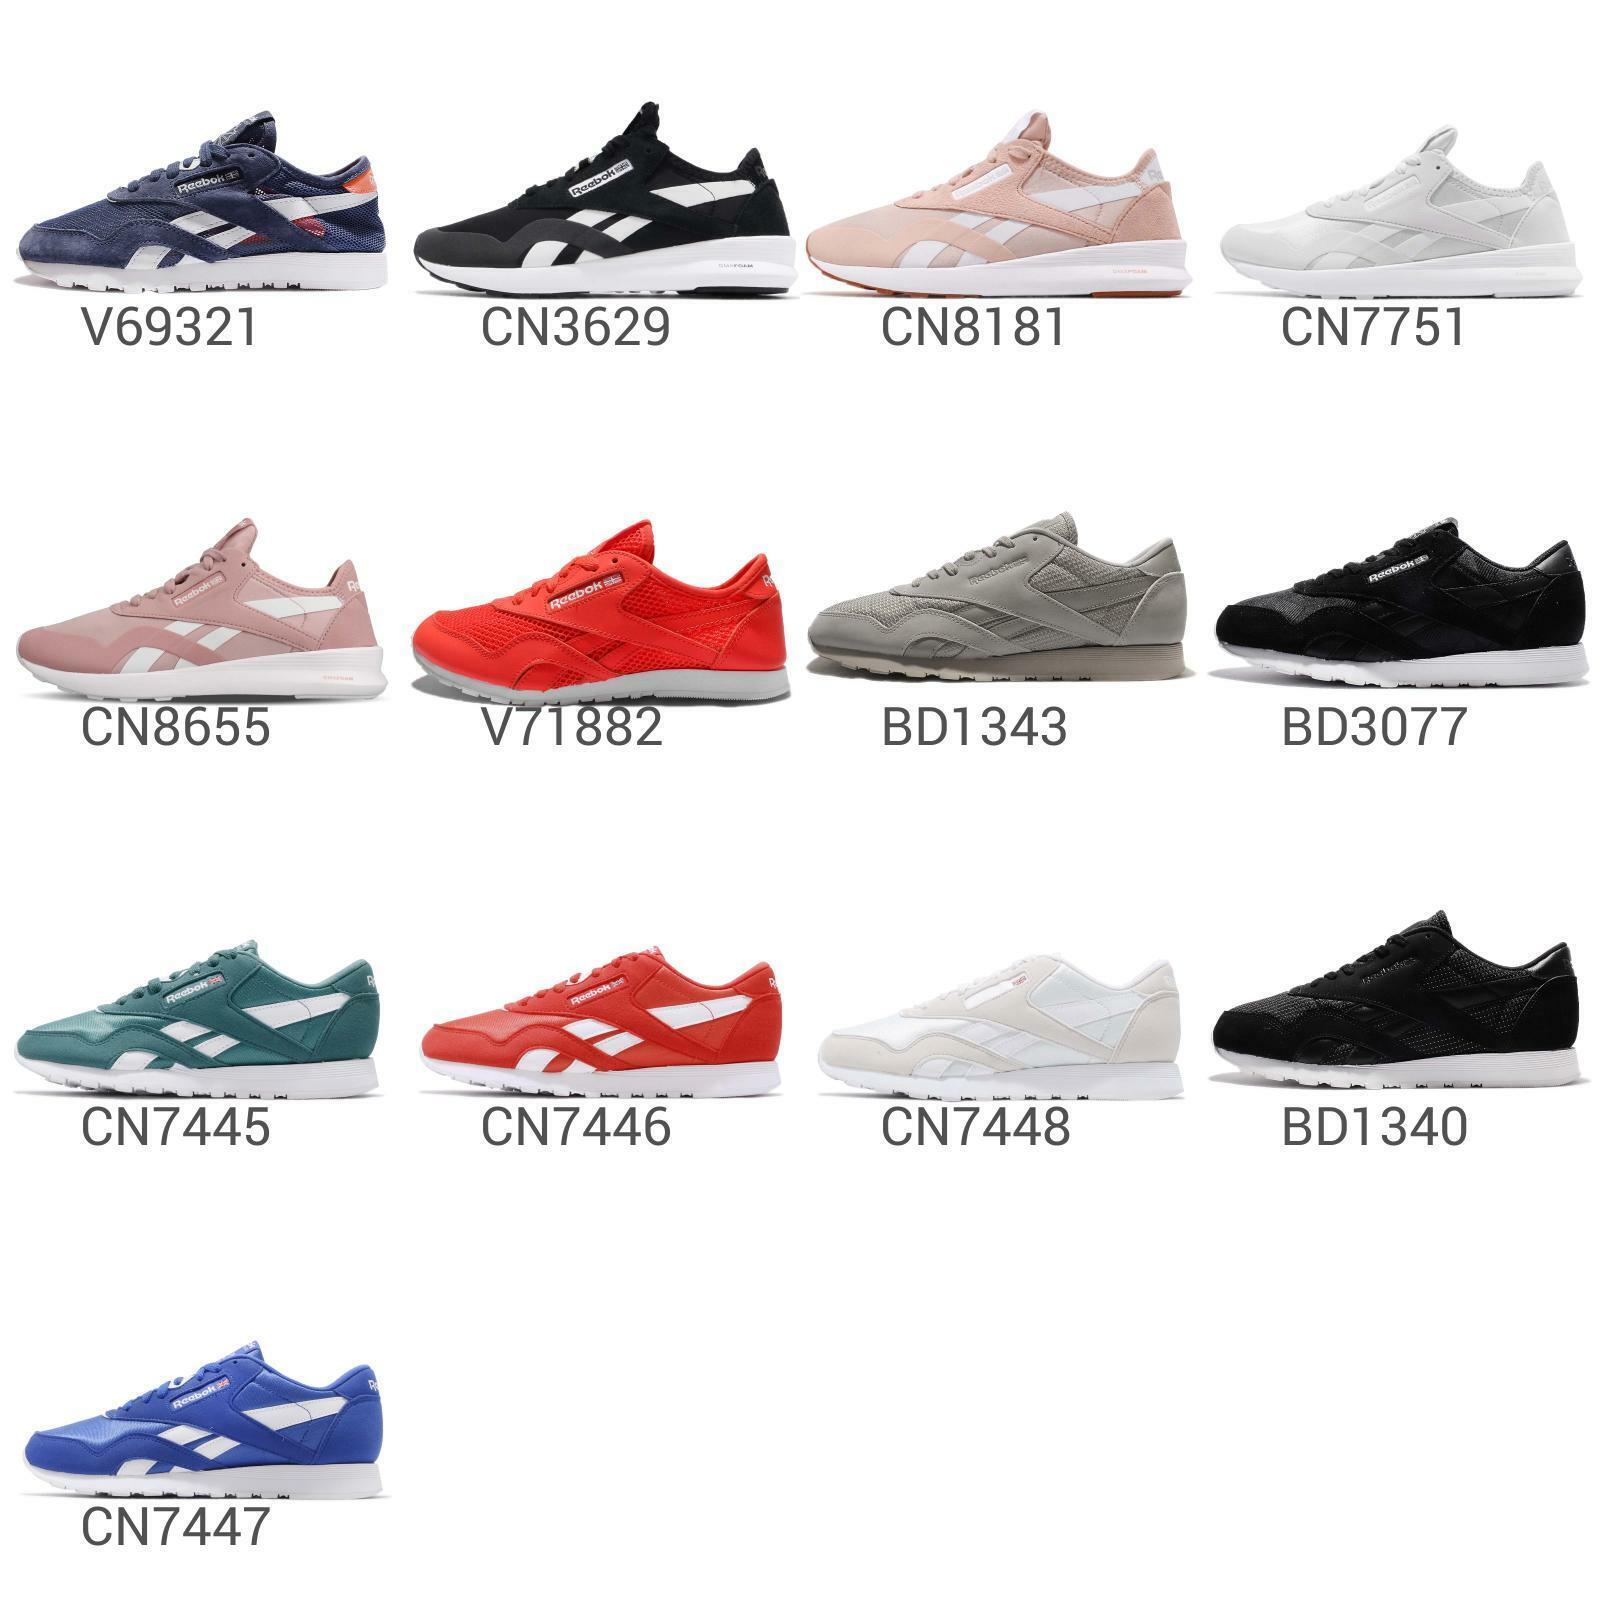 Reebok CL Nylon   SP Men   mujer Classic Trainers zapatillas zapatos Pick 1